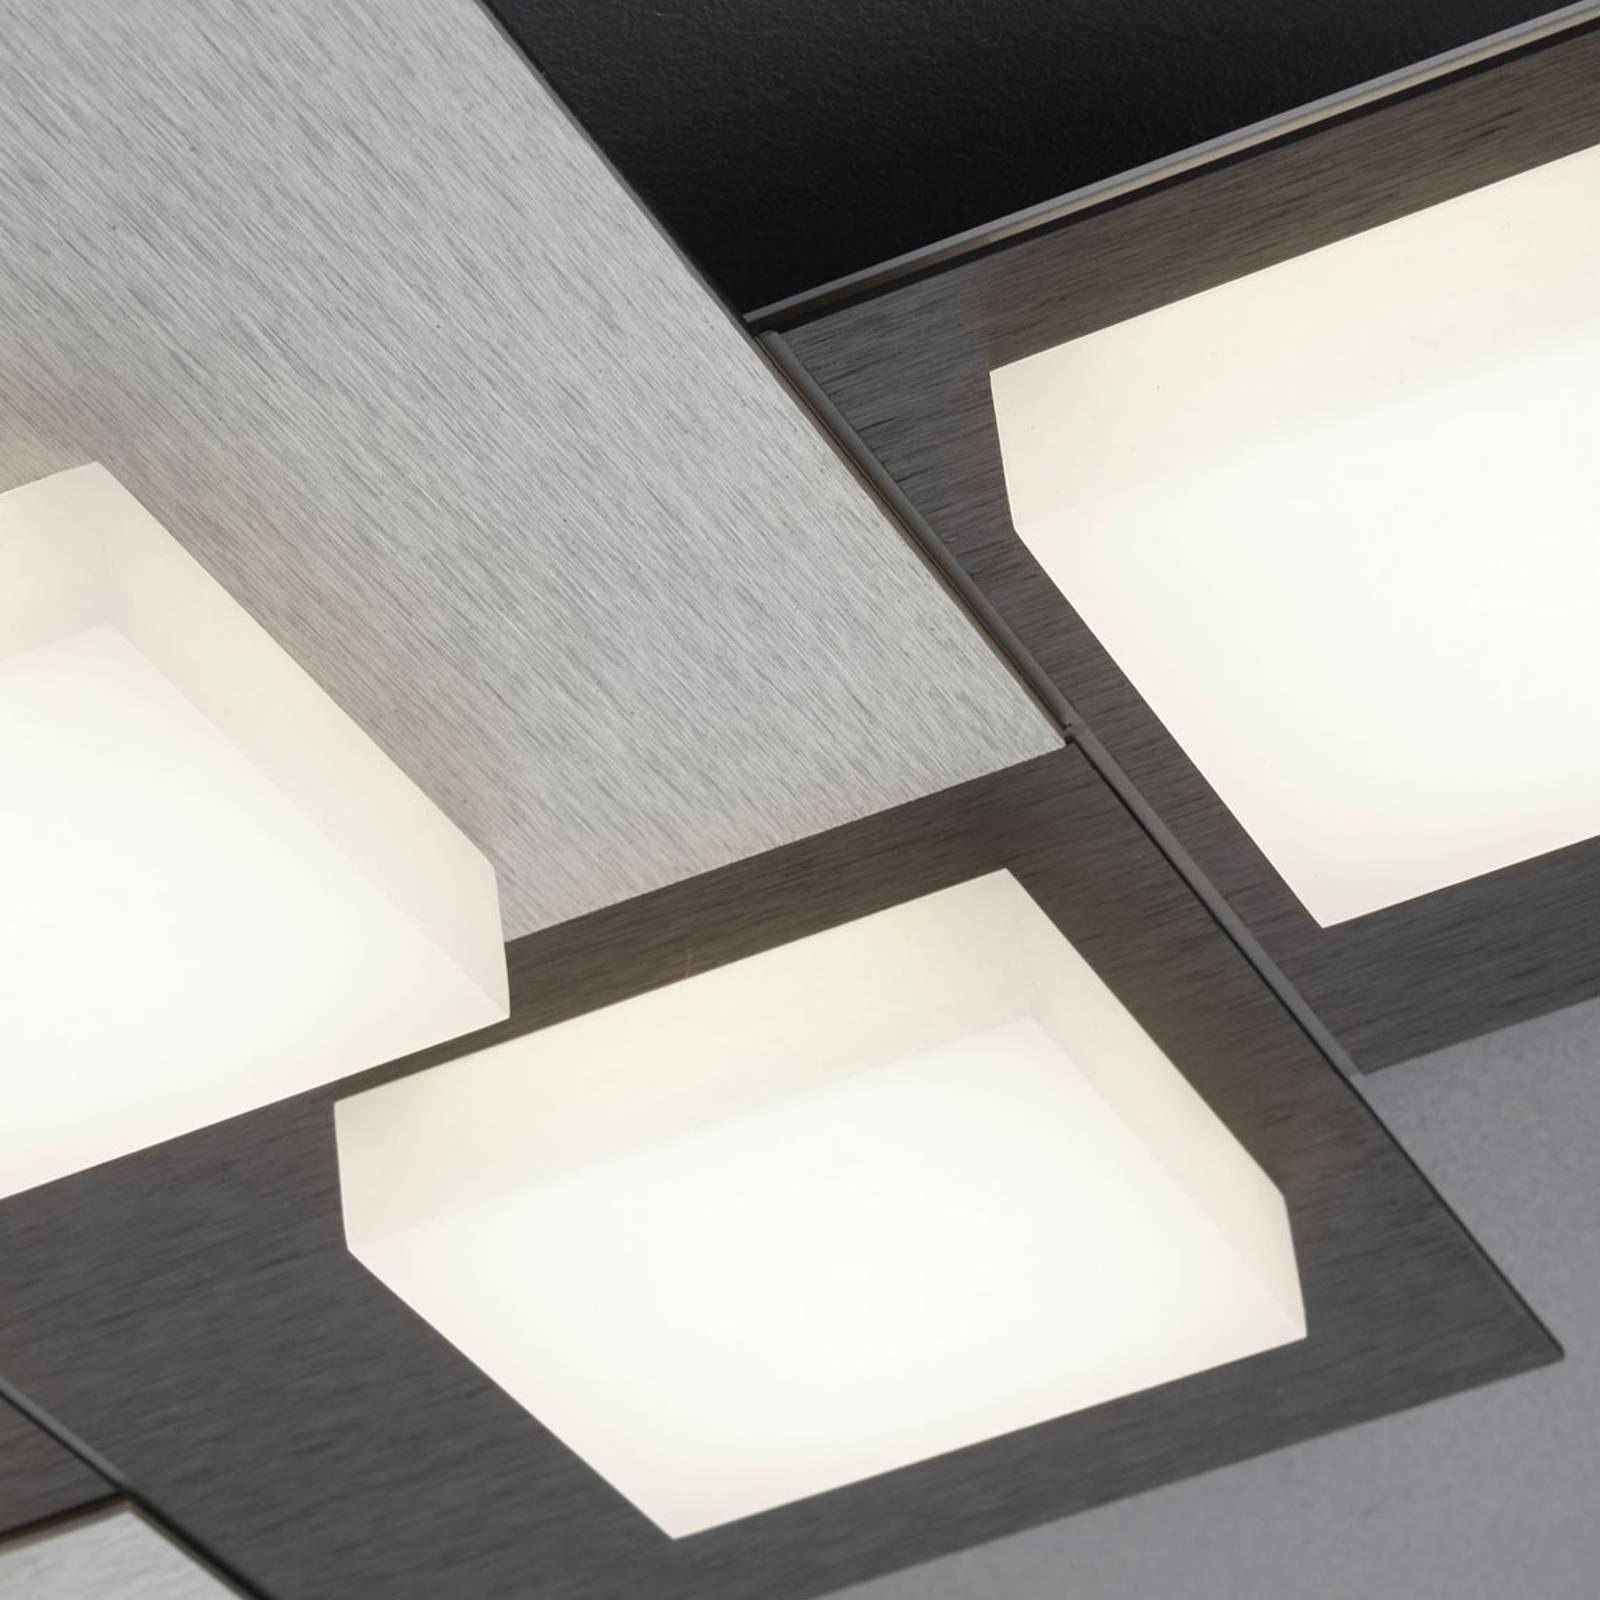 BANKAMP Cube lampa sufitowa 48W, antracyt